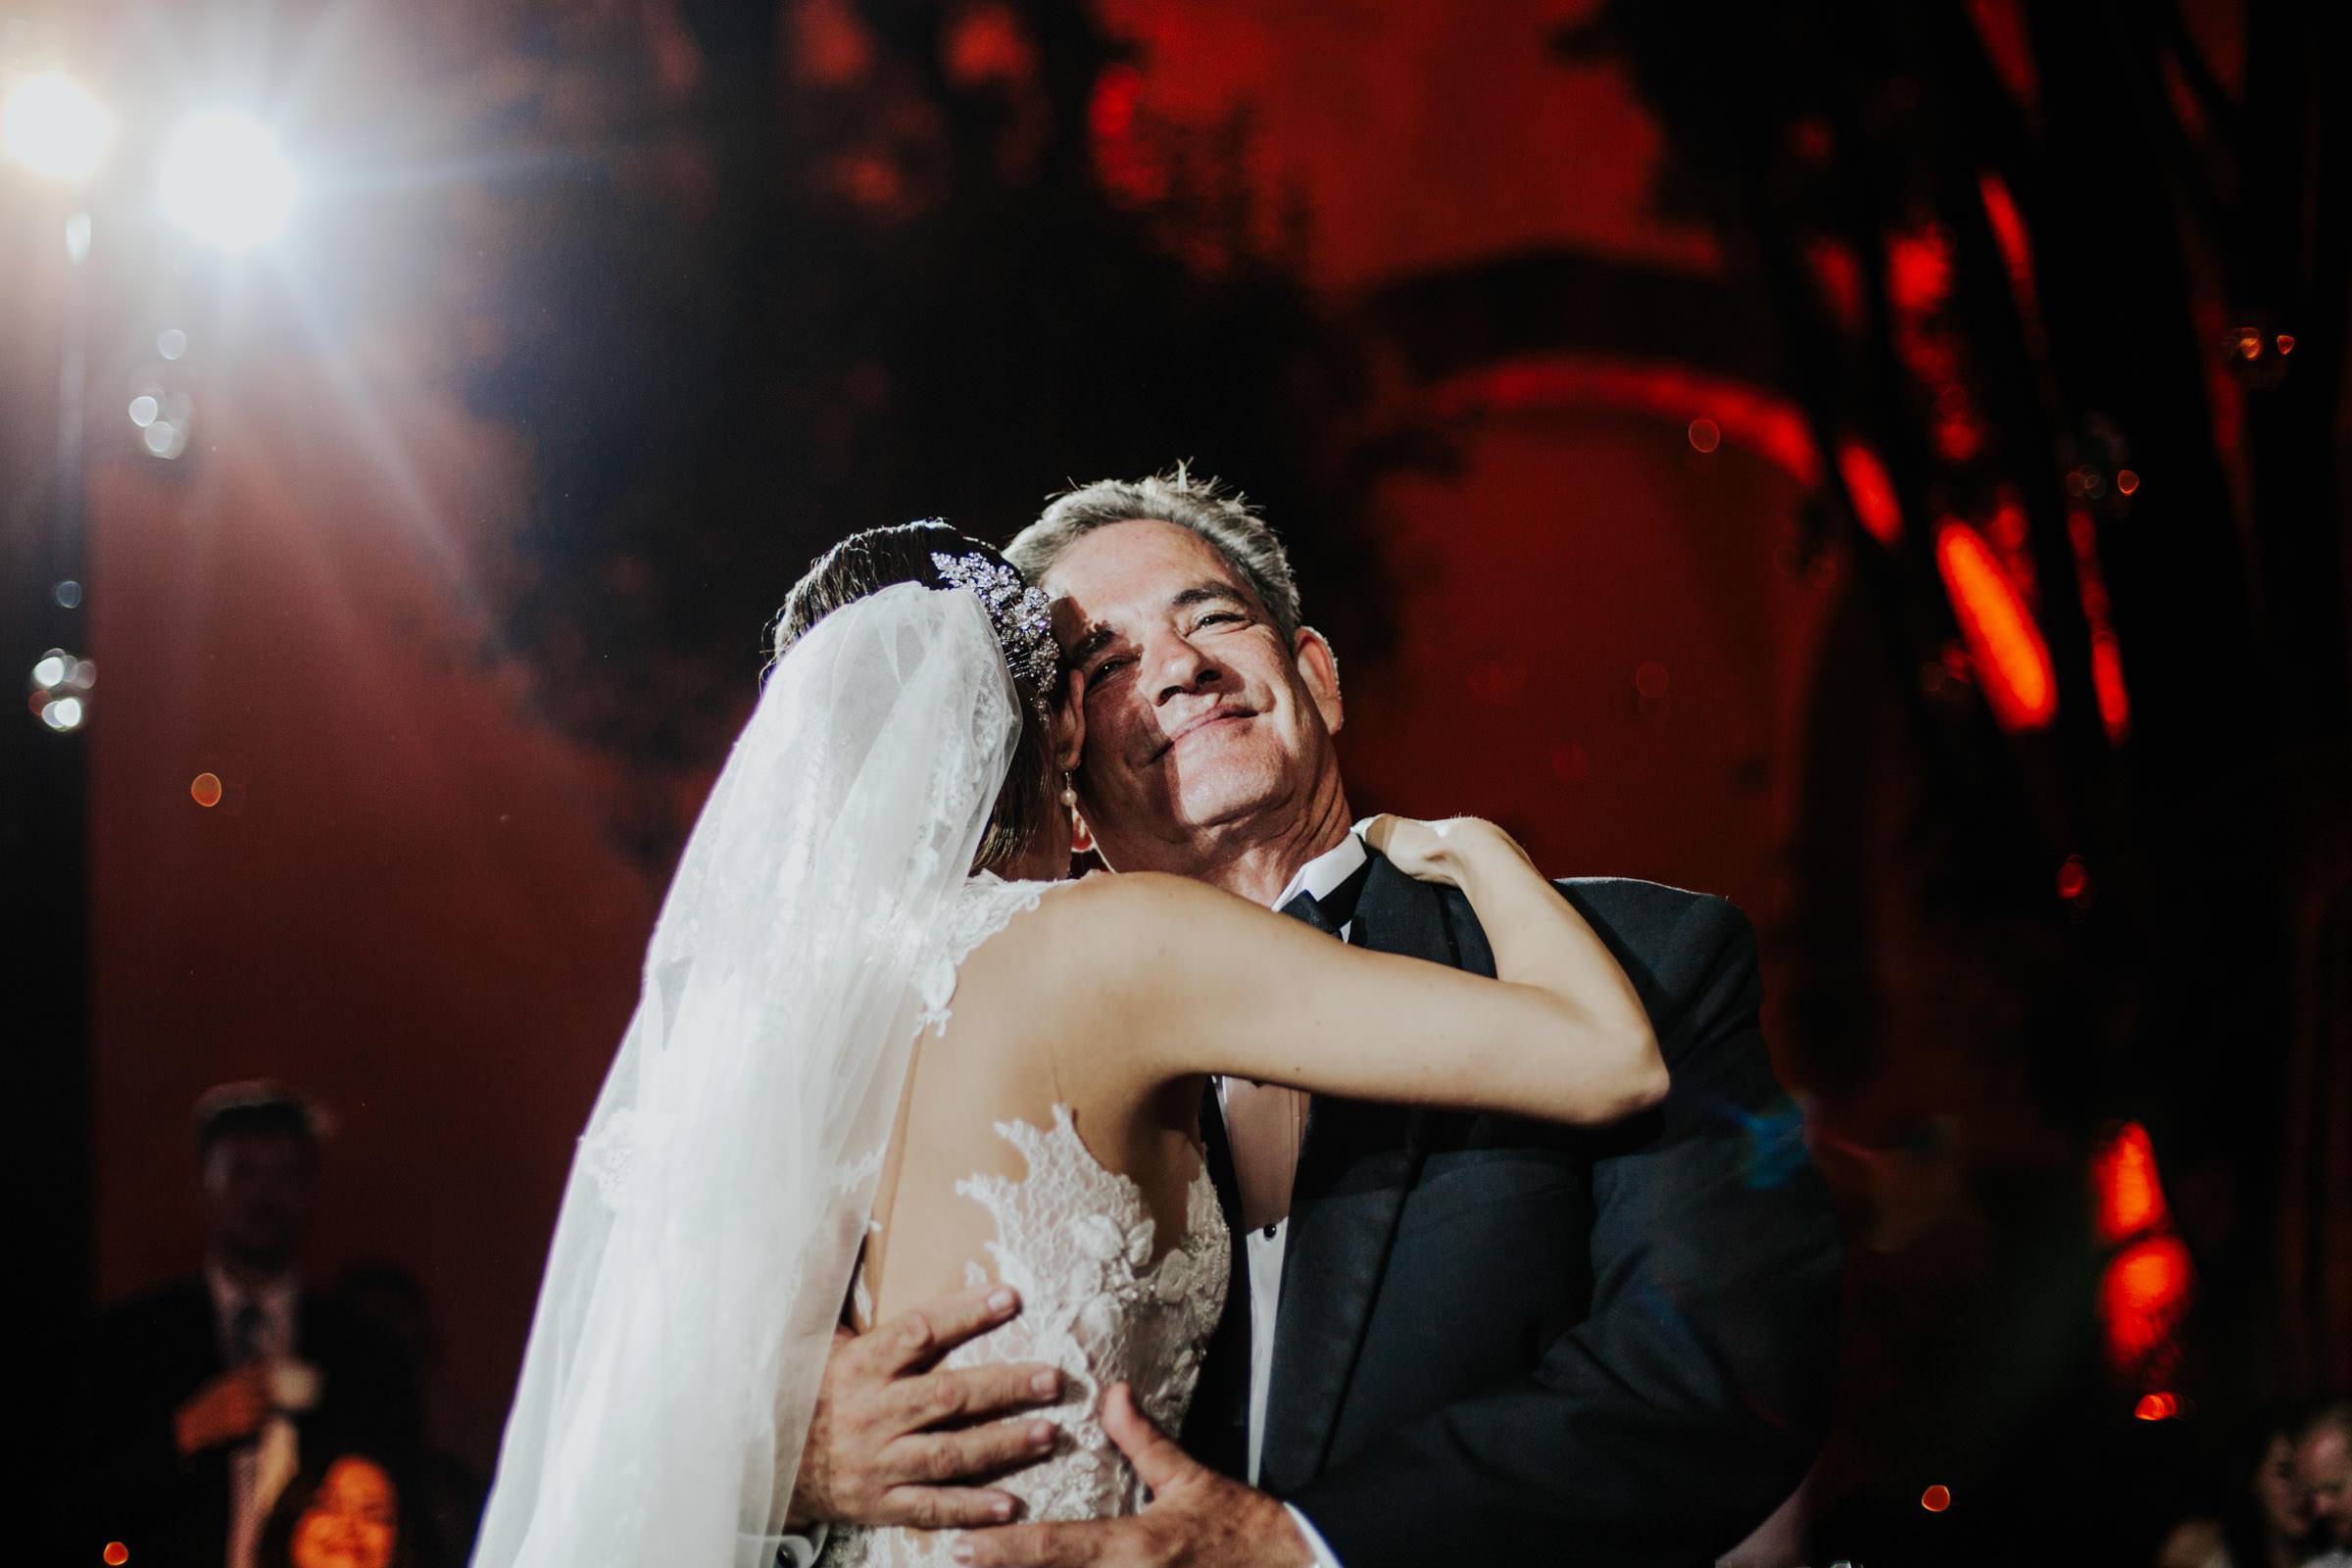 San-Miguel-de-Allende-Wedding-Photography-Parroquia-Instituto-Boda-Fotografia-Fer-Sergio-Pierce-Lifestyle-Photography0020.JPG